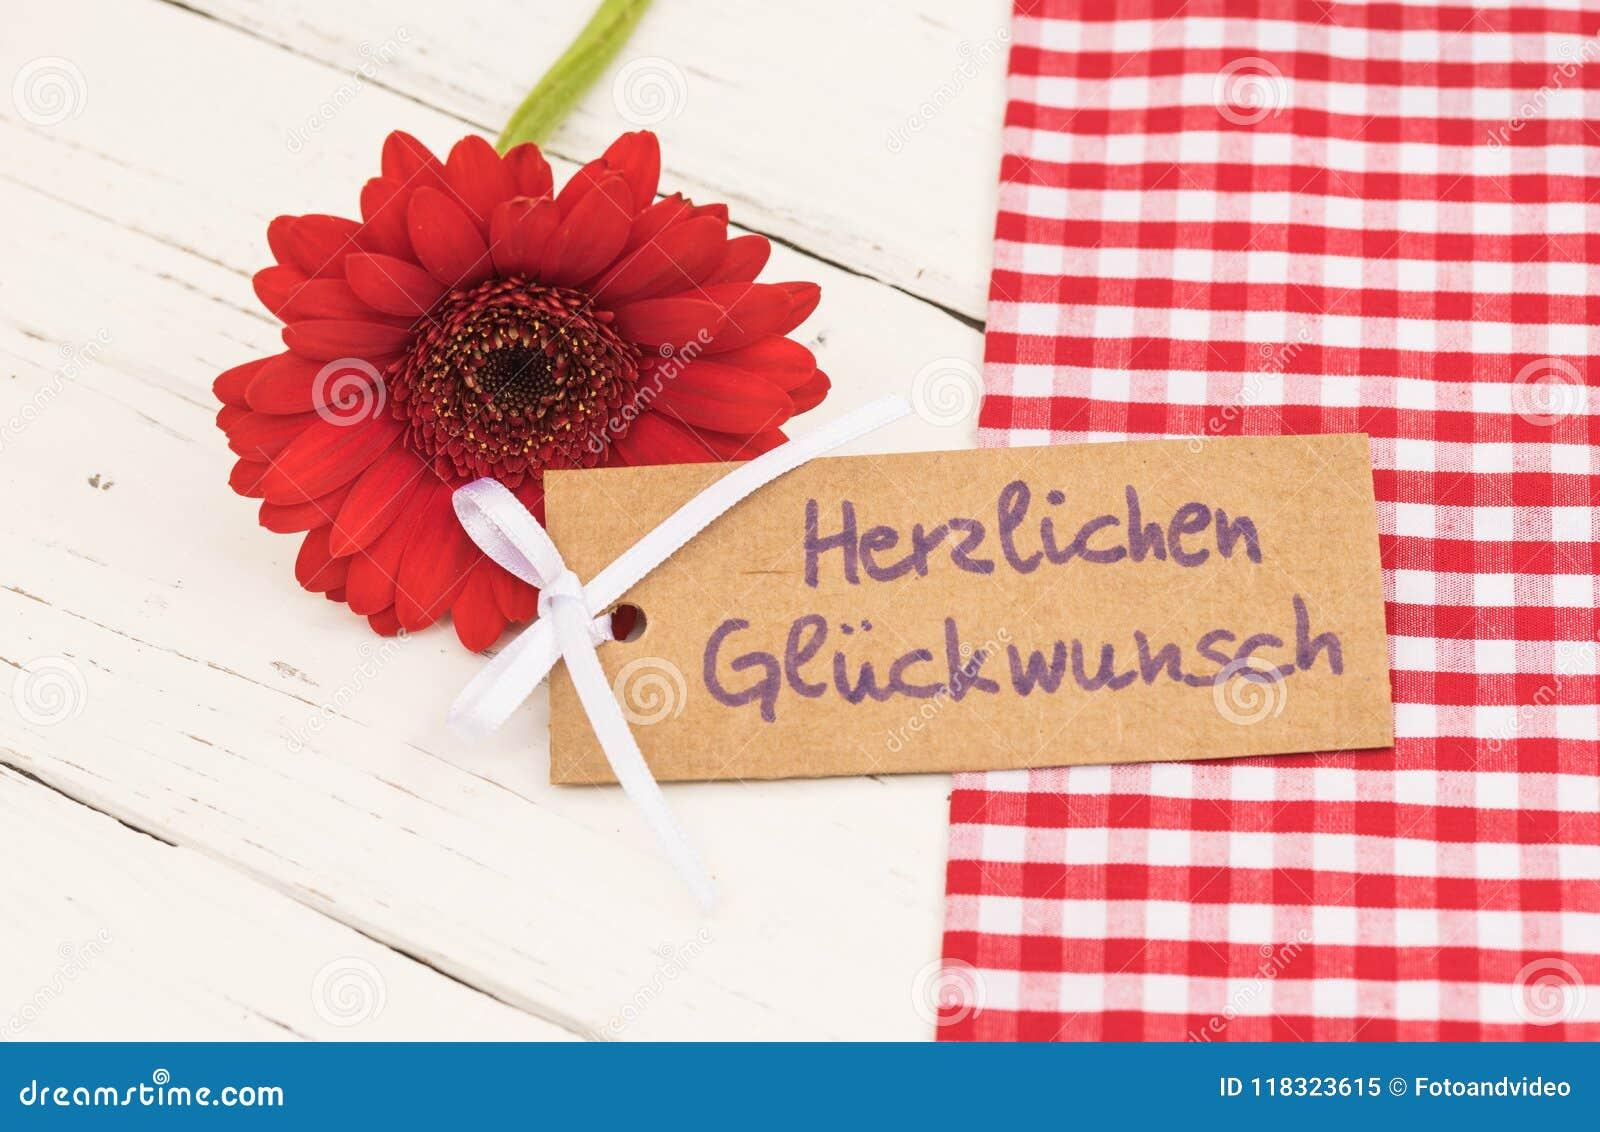 Happy birthday greeting card with german text herzlichen download happy birthday greeting card with german text herzlichen glueckwunsch and red gerbera daisy flower m4hsunfo